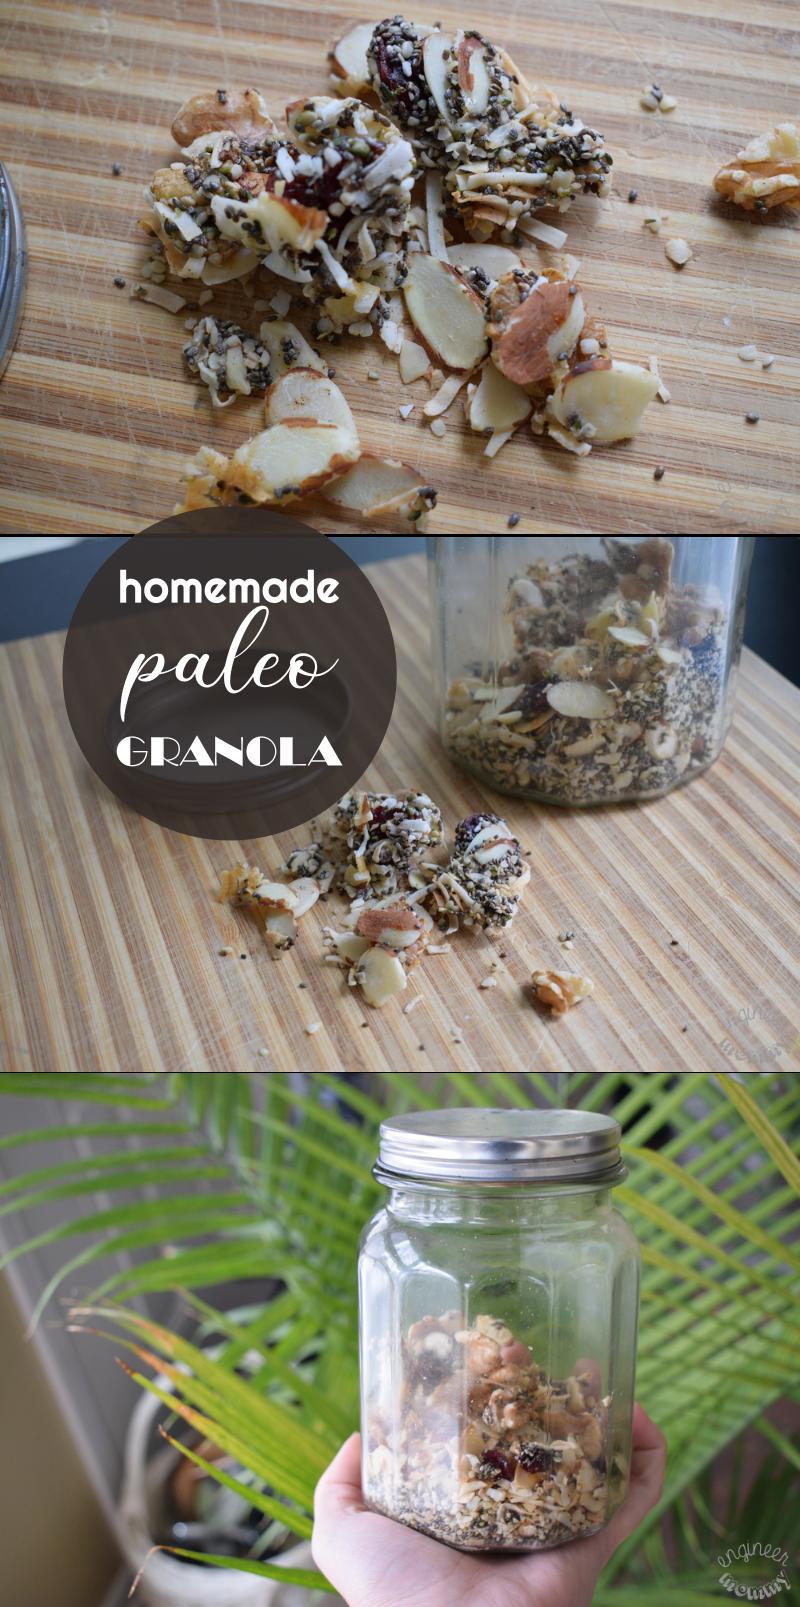 Simple Homemade Paleo Granola – Easy to Customize!